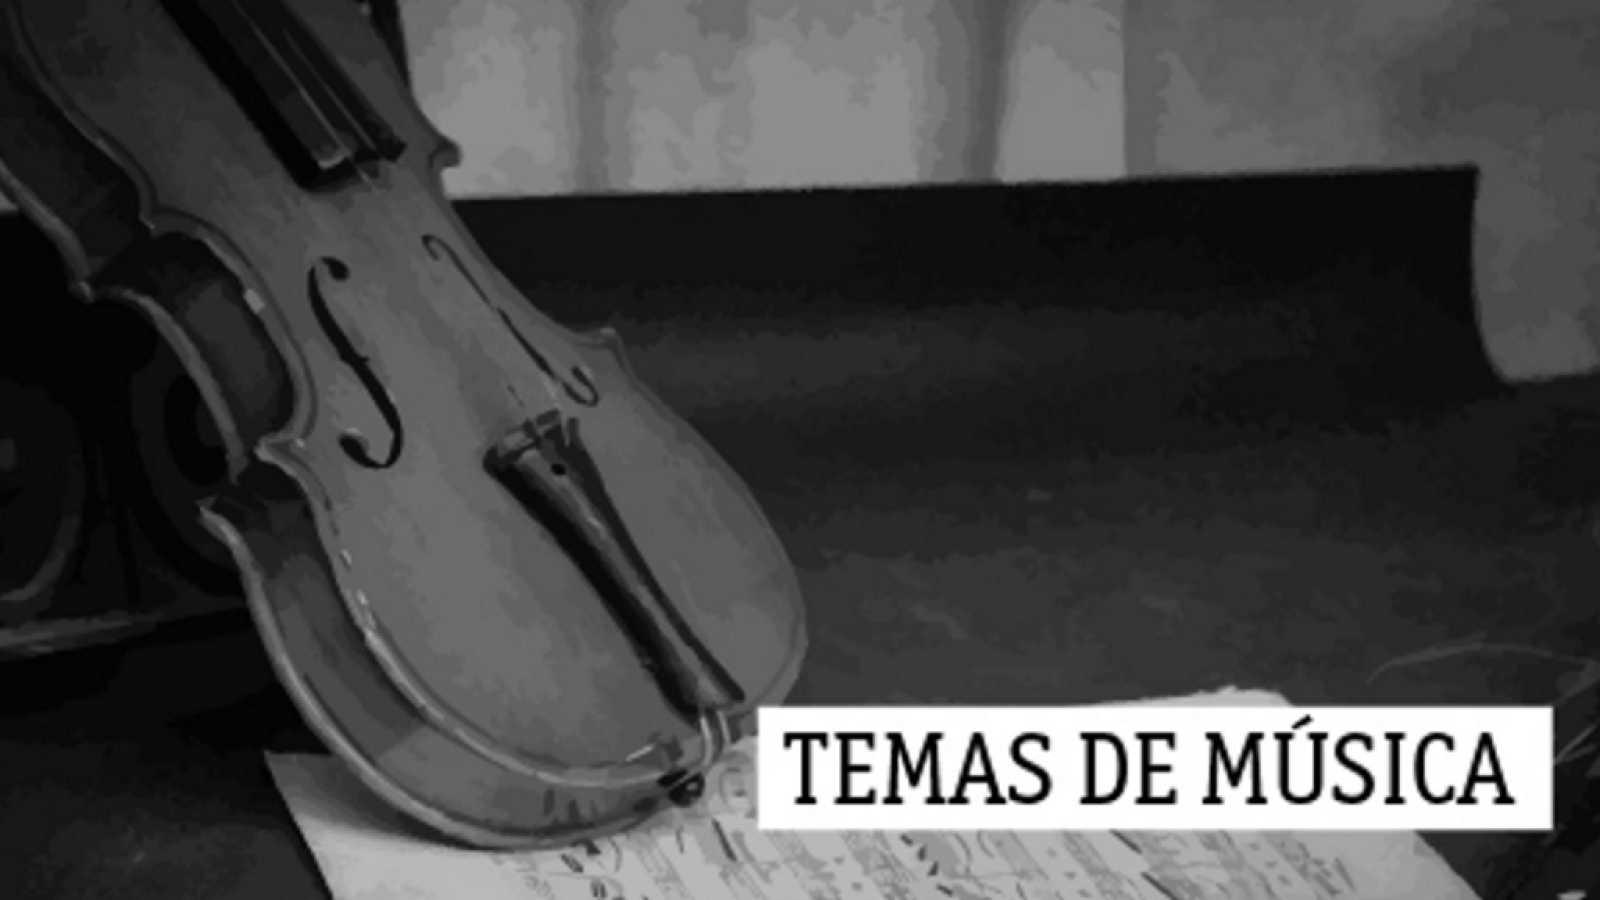 Temas de música - Diálogo a 4: Cuartetos de cuerda de Beethoven (VII) - 25/07/20 - escuchar ahora